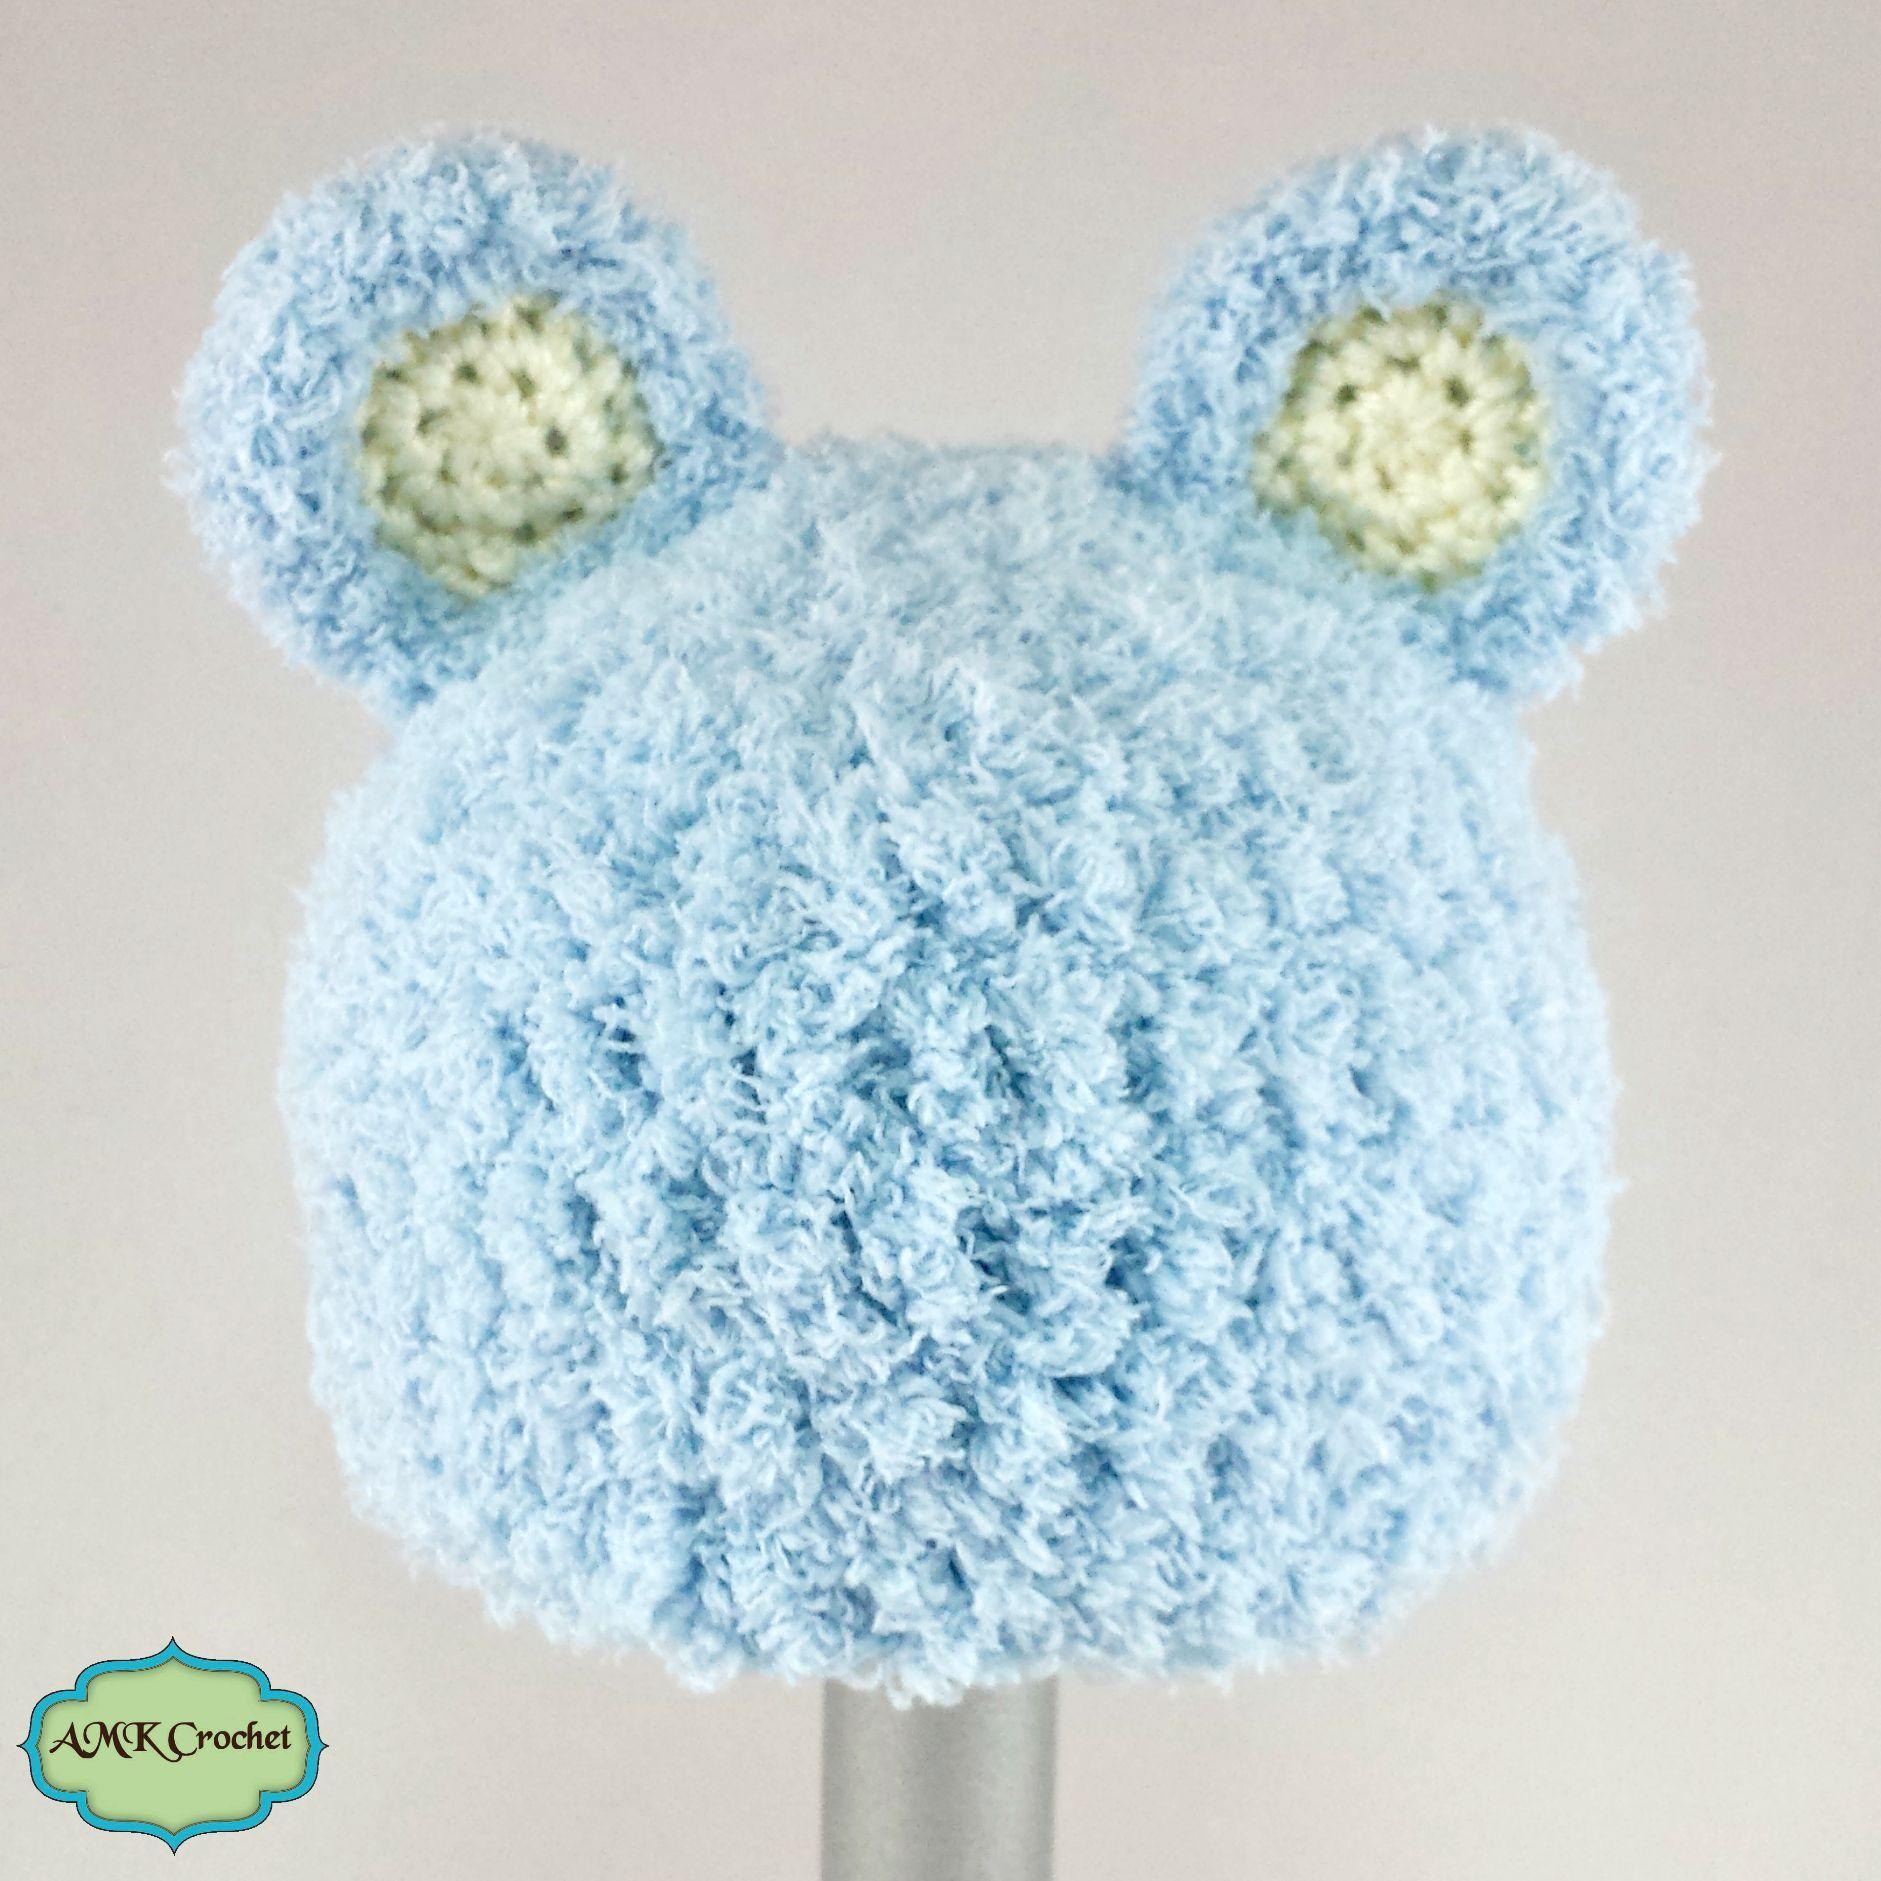 Bernat Pipsqueak Yarn Is A Super Soft Bulky Weight Size 5 Yarn